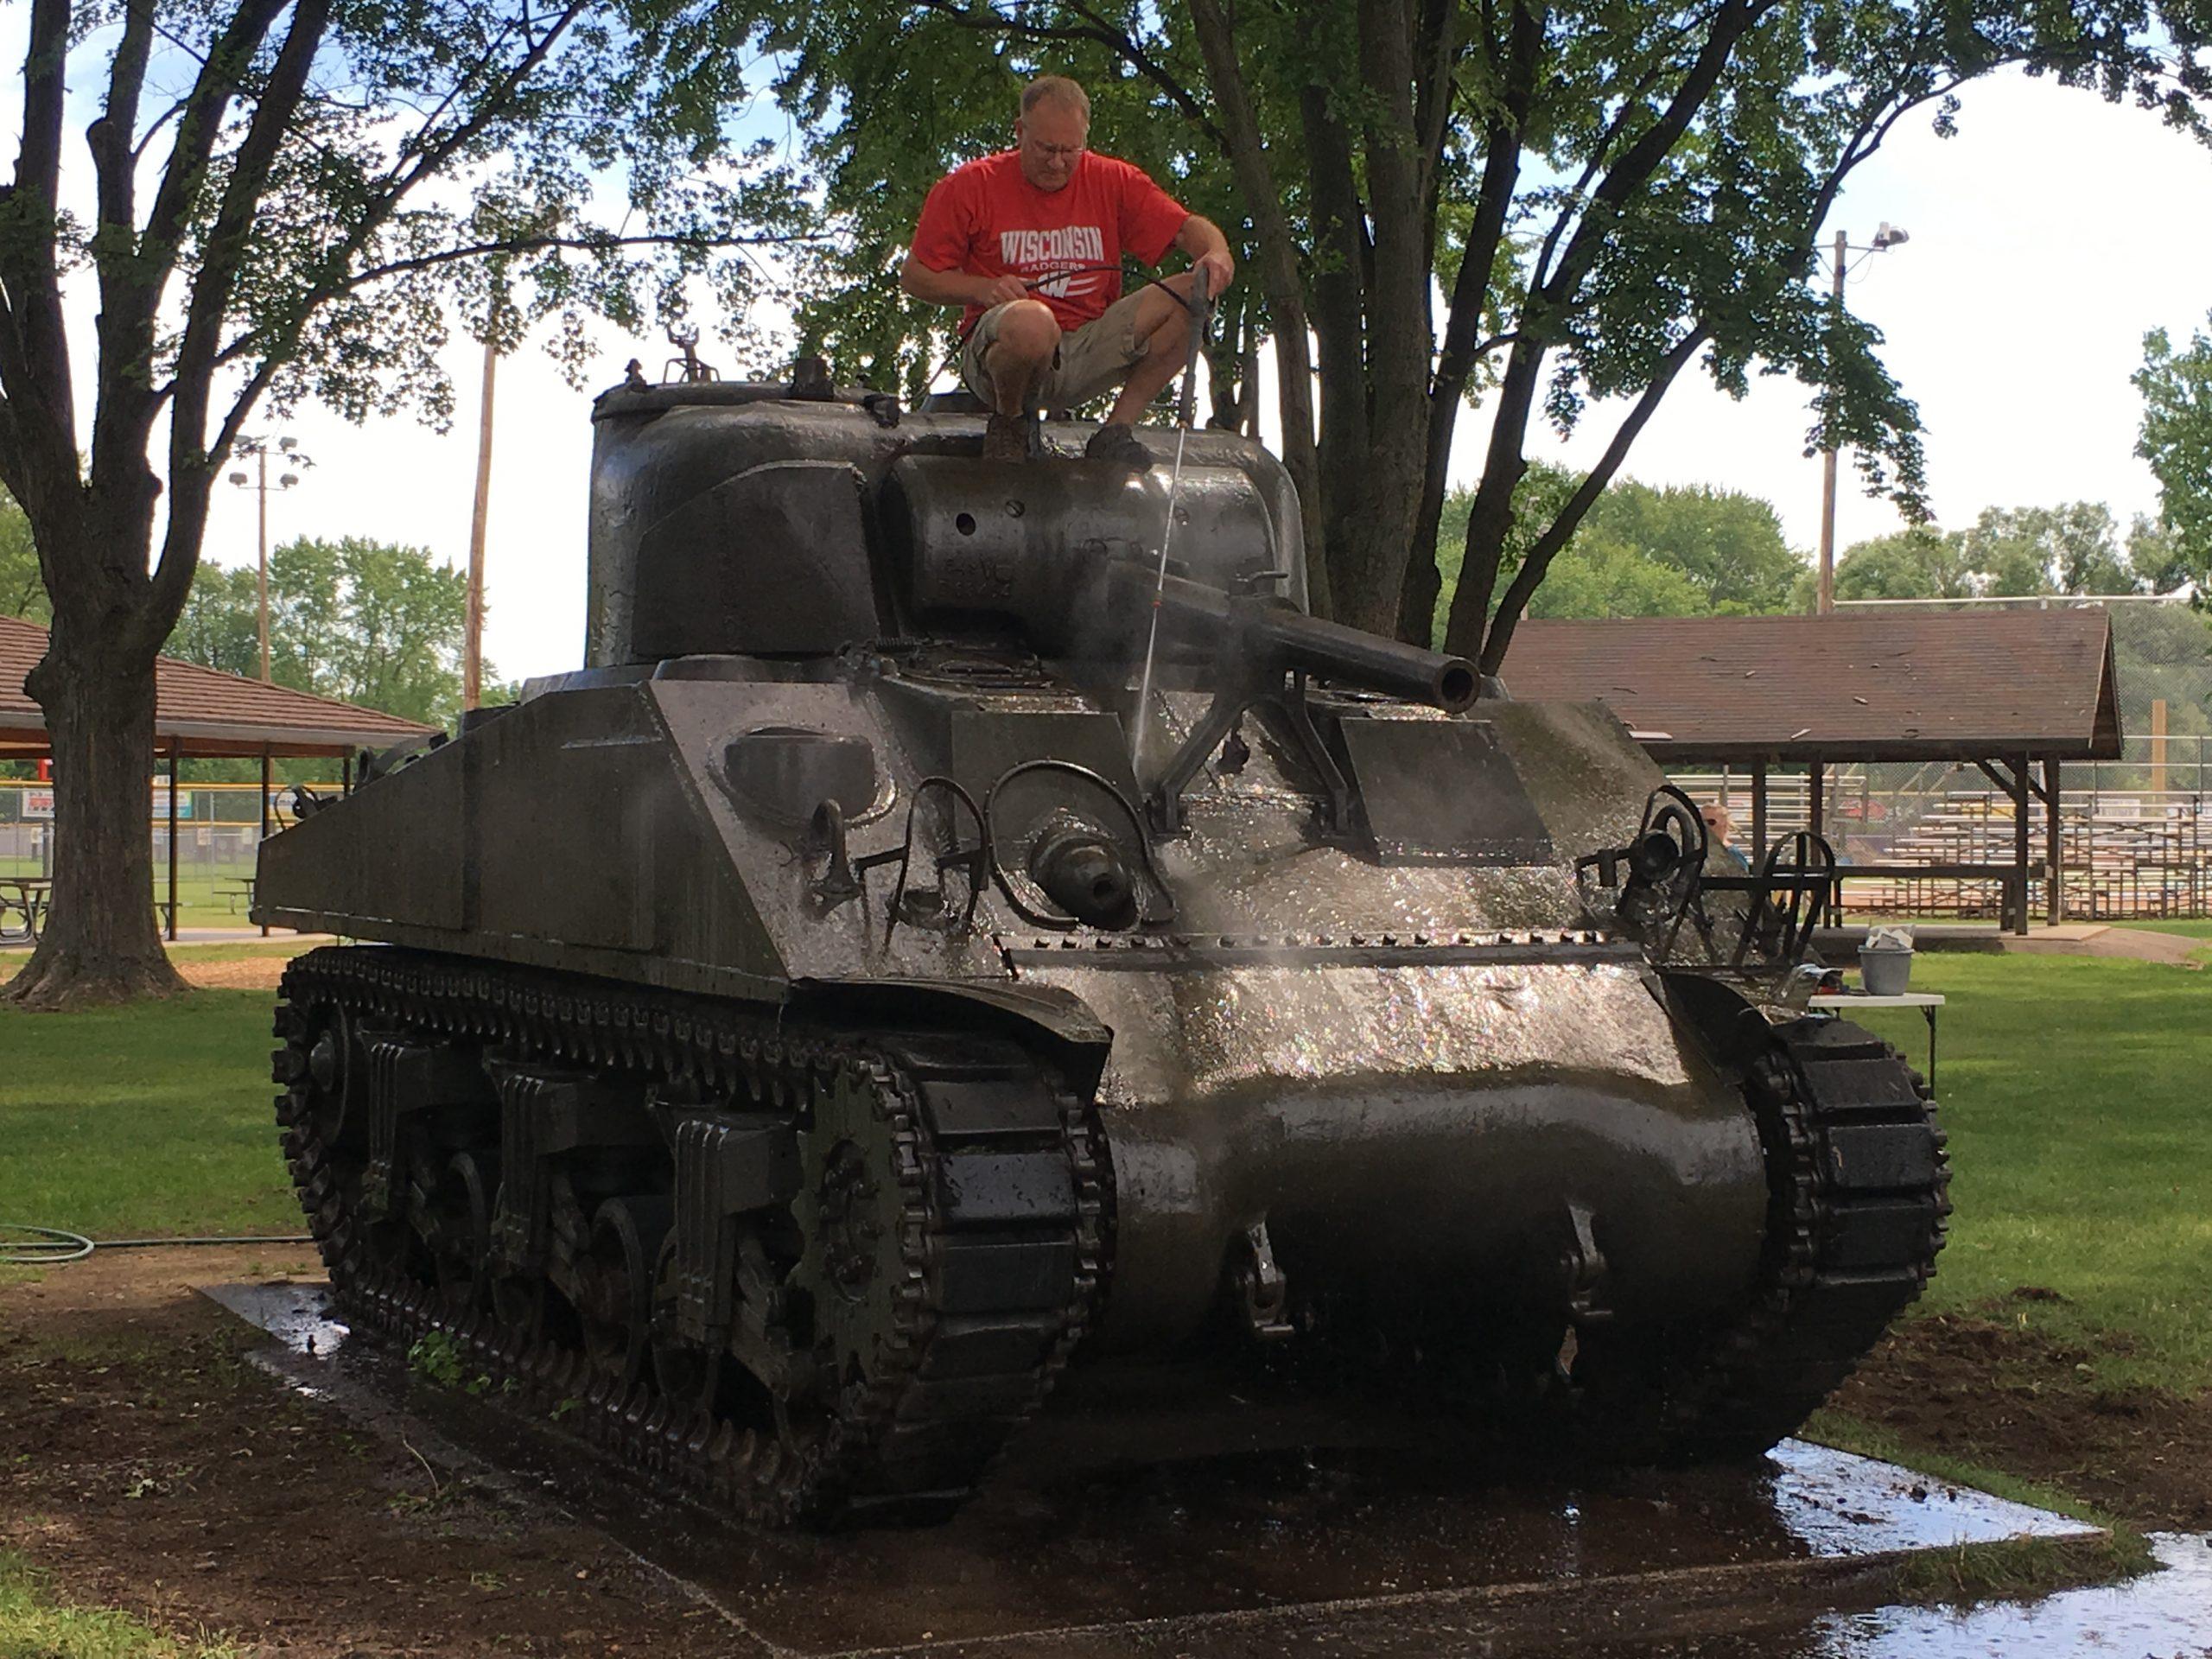 Tank Restoration in Memorial Park Started Today